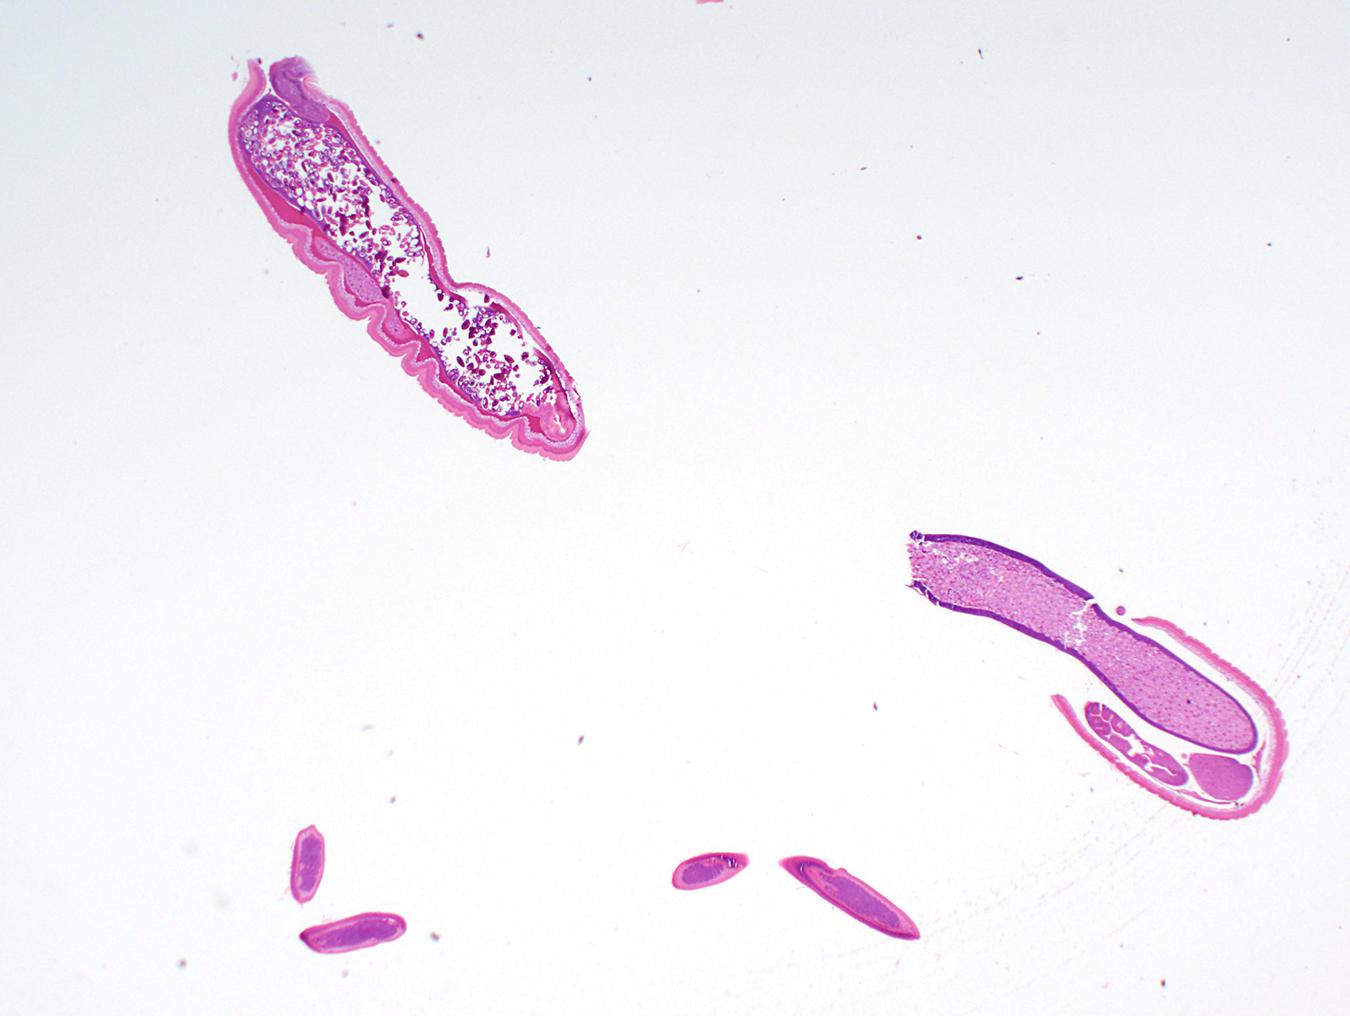 Archer - Beautiful Parasite by cfowler7-SFM on DeviantArt  |Beautiful Parasites